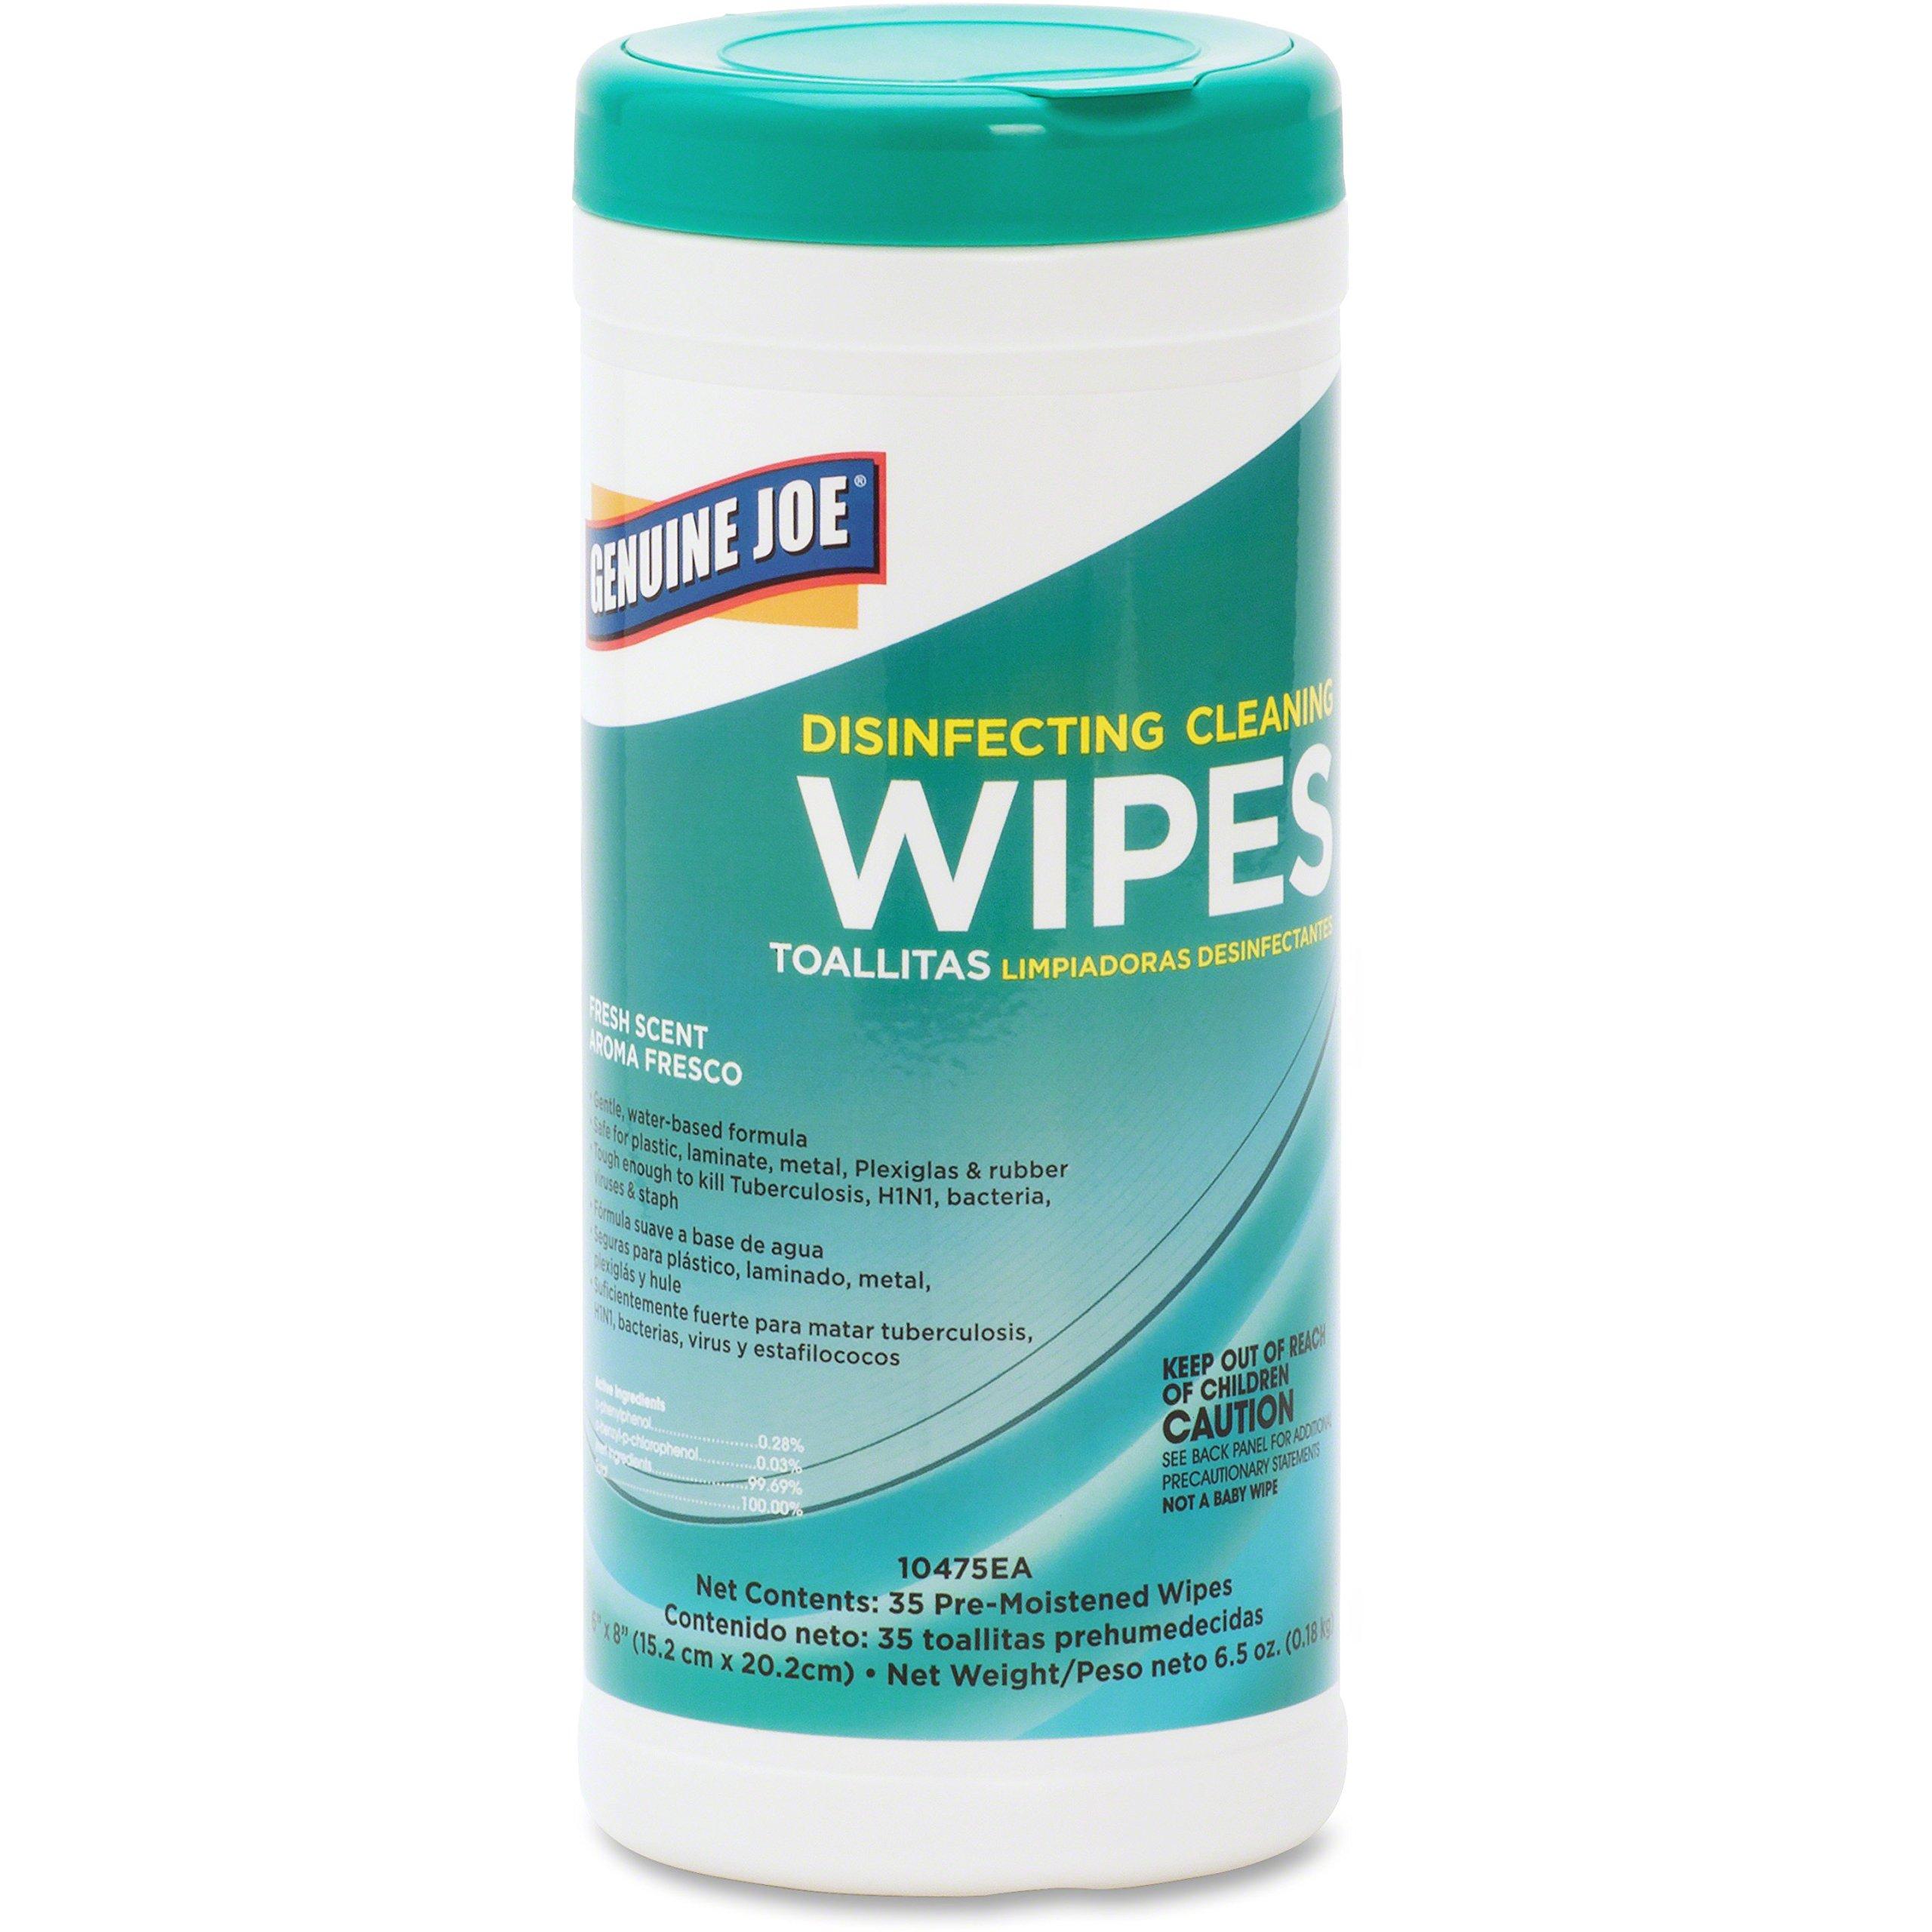 Genuine Joe 10475EA Disinfecting Cleaning Wipes, 35 Shts/Tub, Fresh Scent